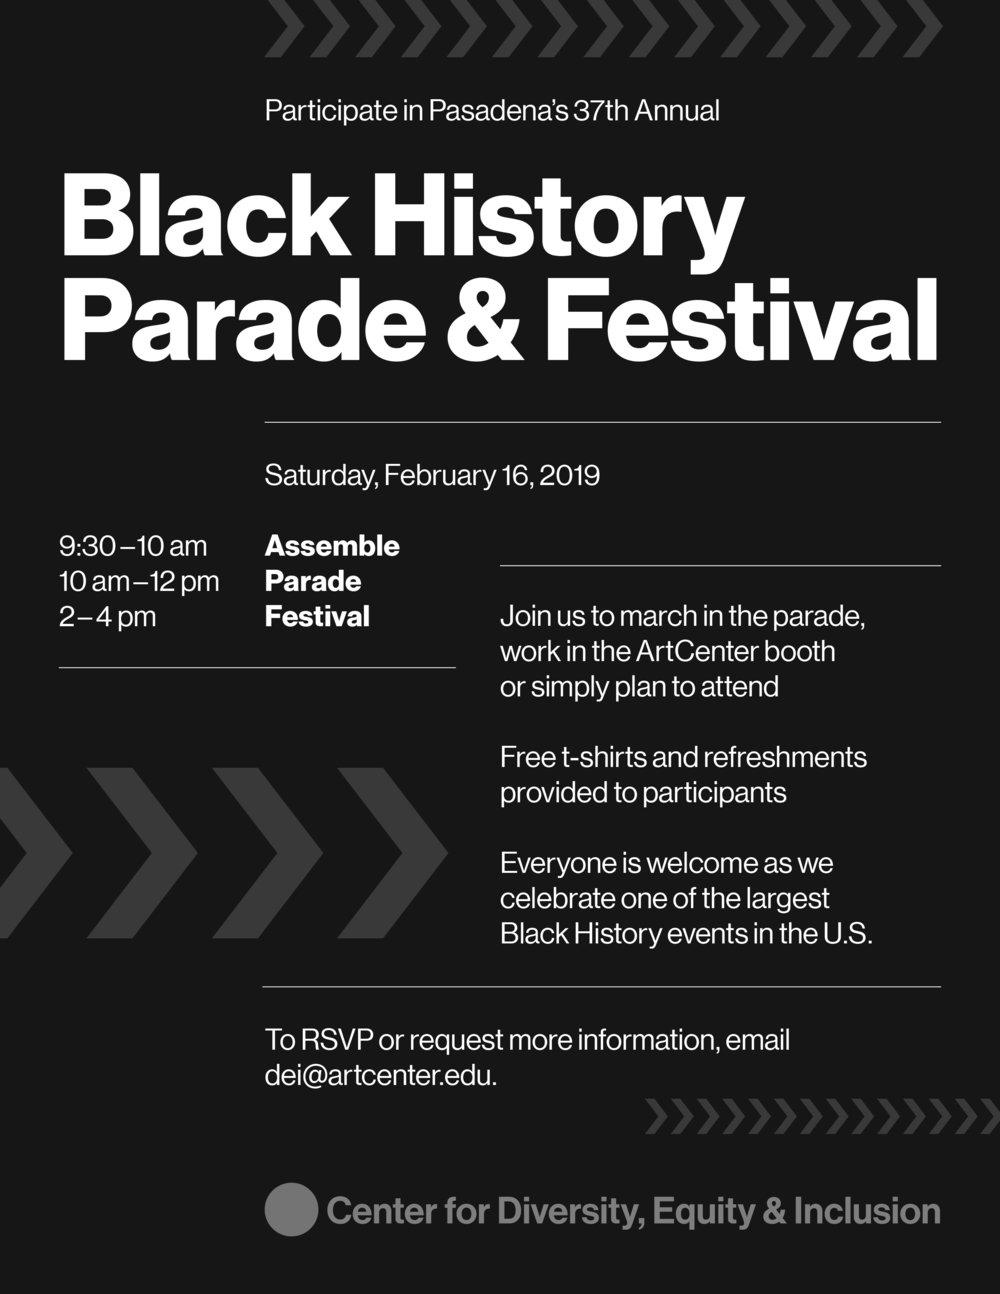 black history parade_8.5x11.jpg